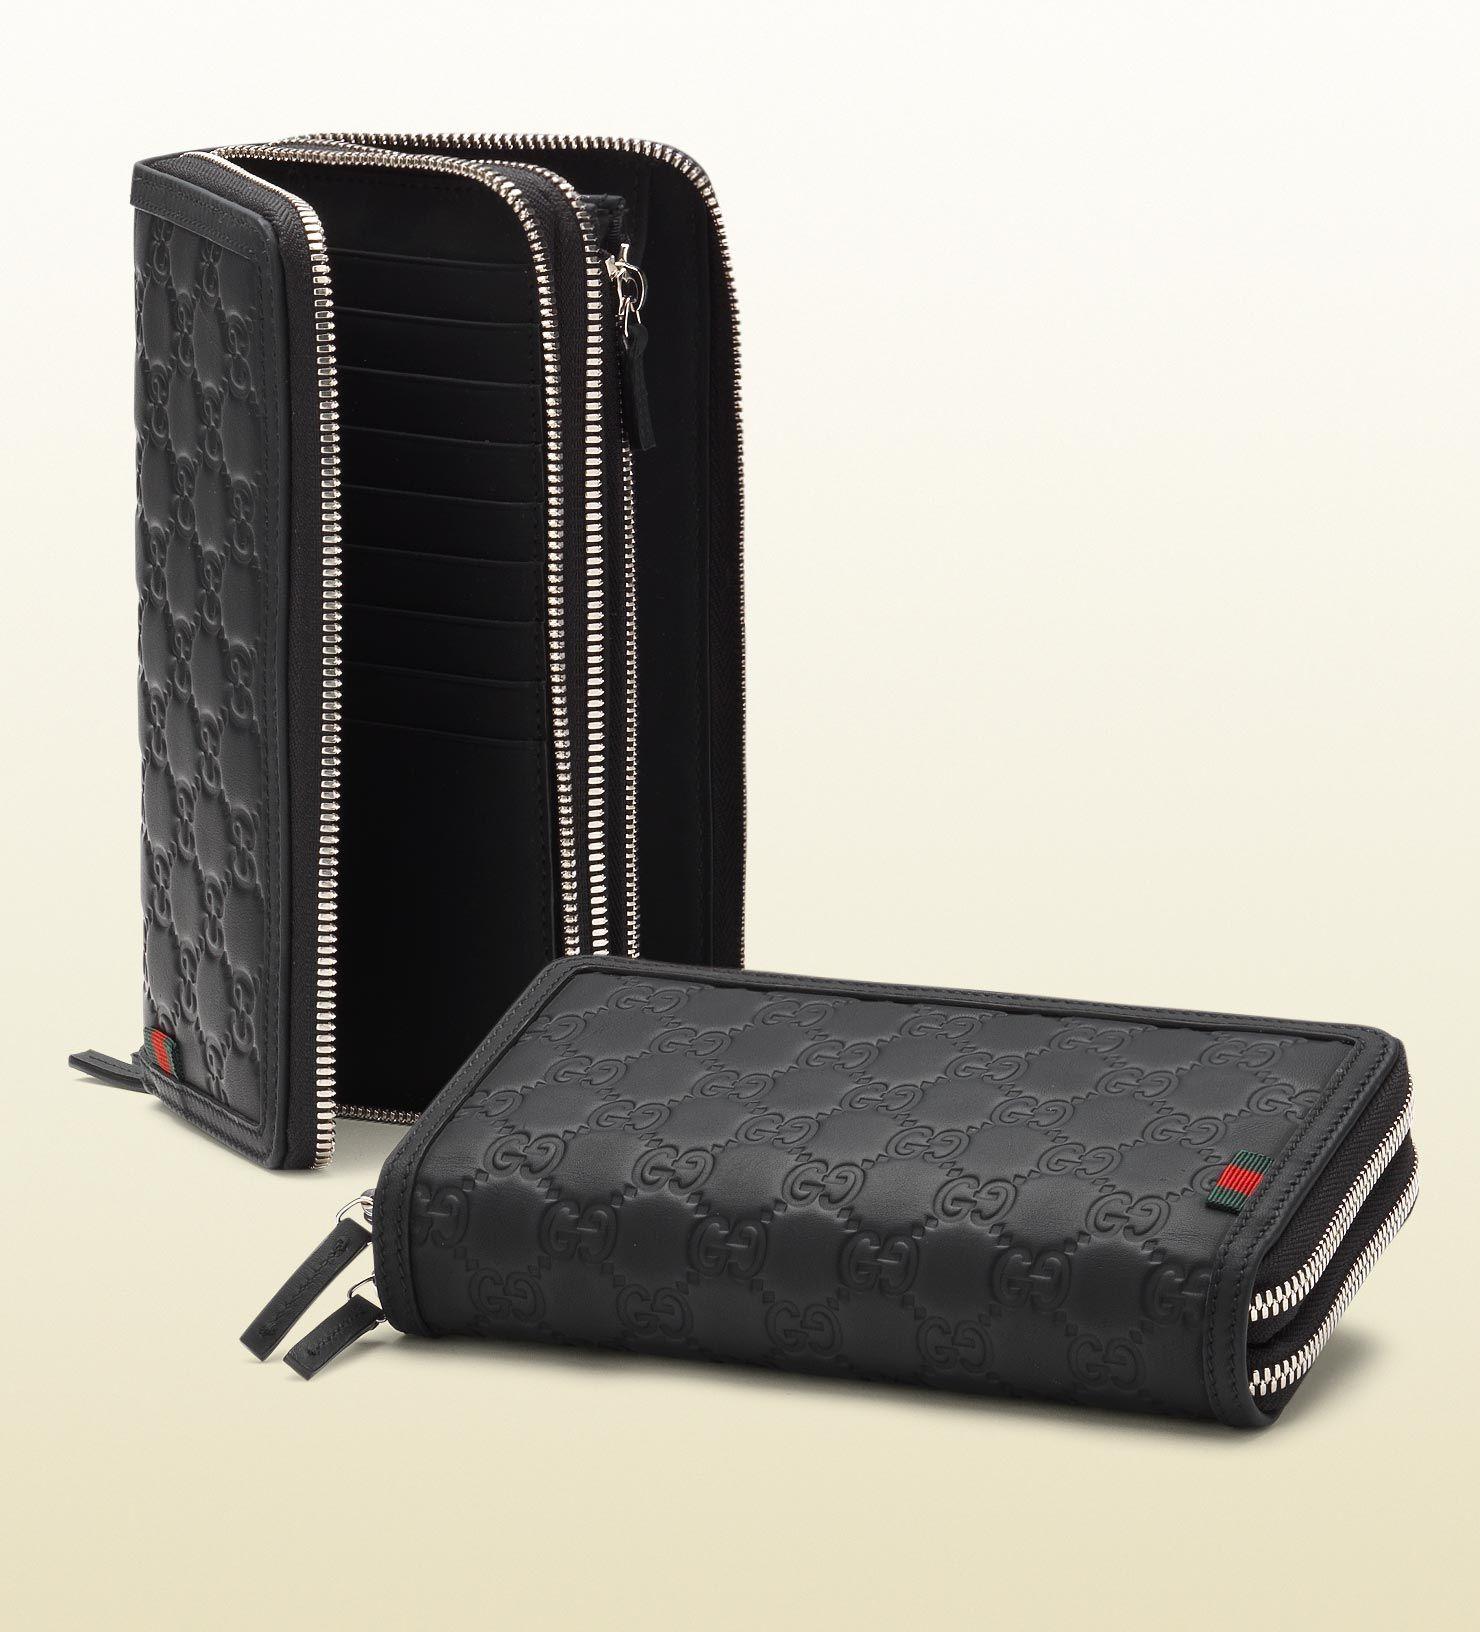 983bb1da27f Gucci double zip around wallet (exotic print not shown)  S5